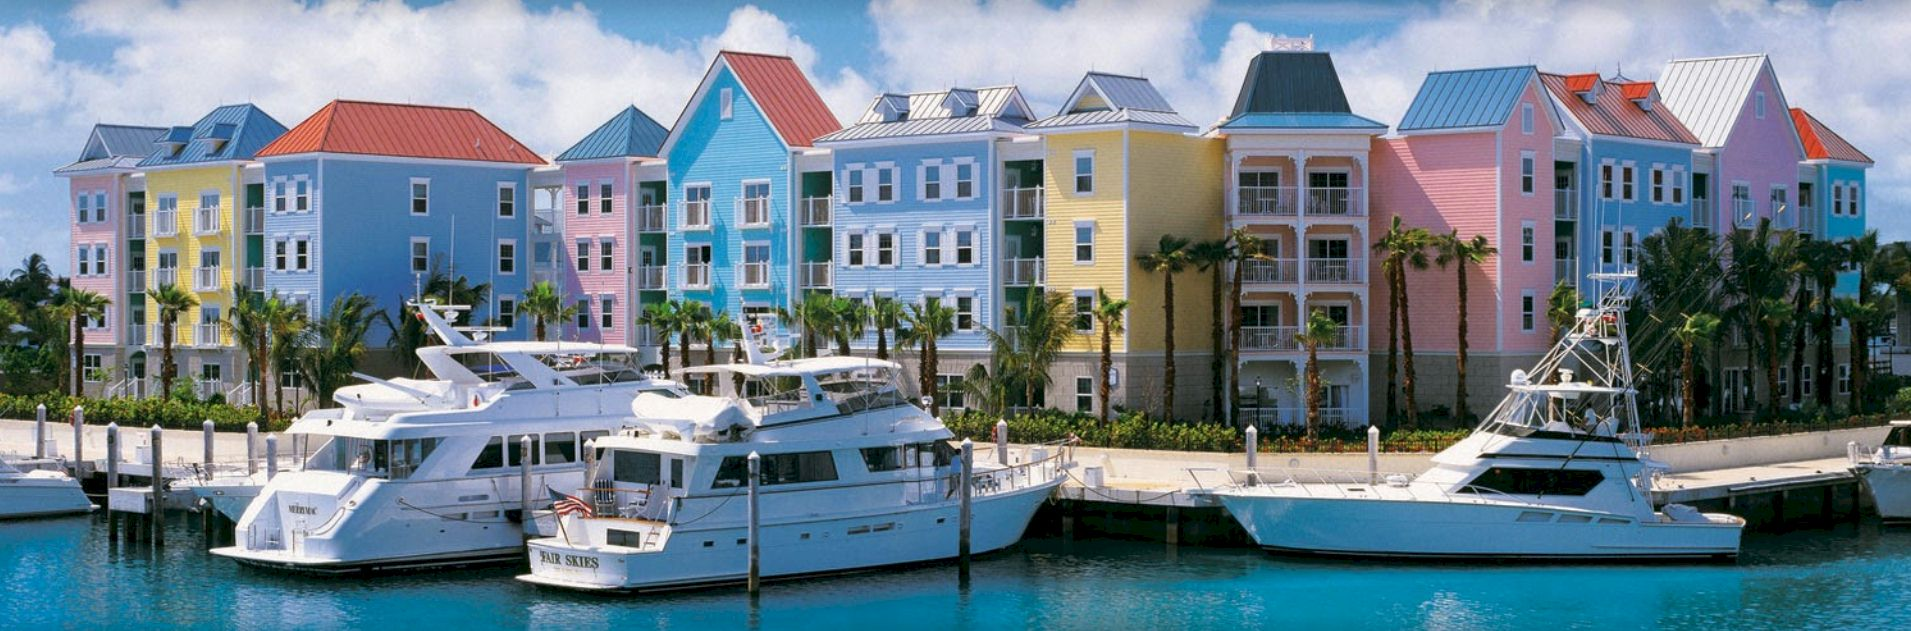 Harborside Resort Bahamas